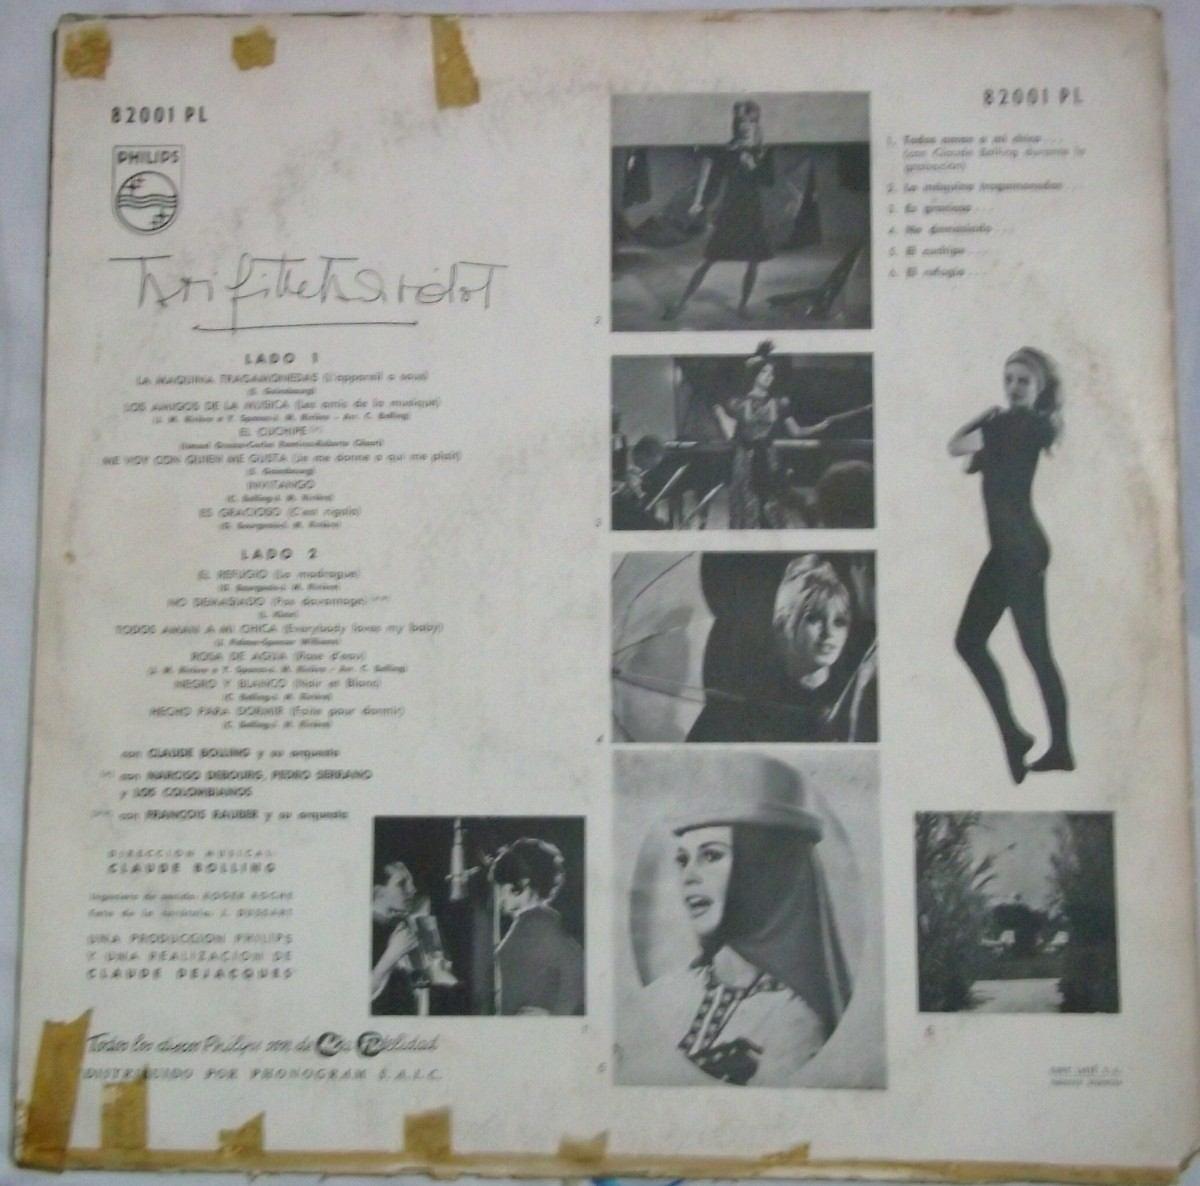 http://4.bp.blogspot.com/-LzP0-EICmB4/UAN3NnETsUI/AAAAAAAAAas/-tsr3R4TbTI/s1600/vendo-disco-brigitte-bardot_MLA-F-2871536650_072012.jpg